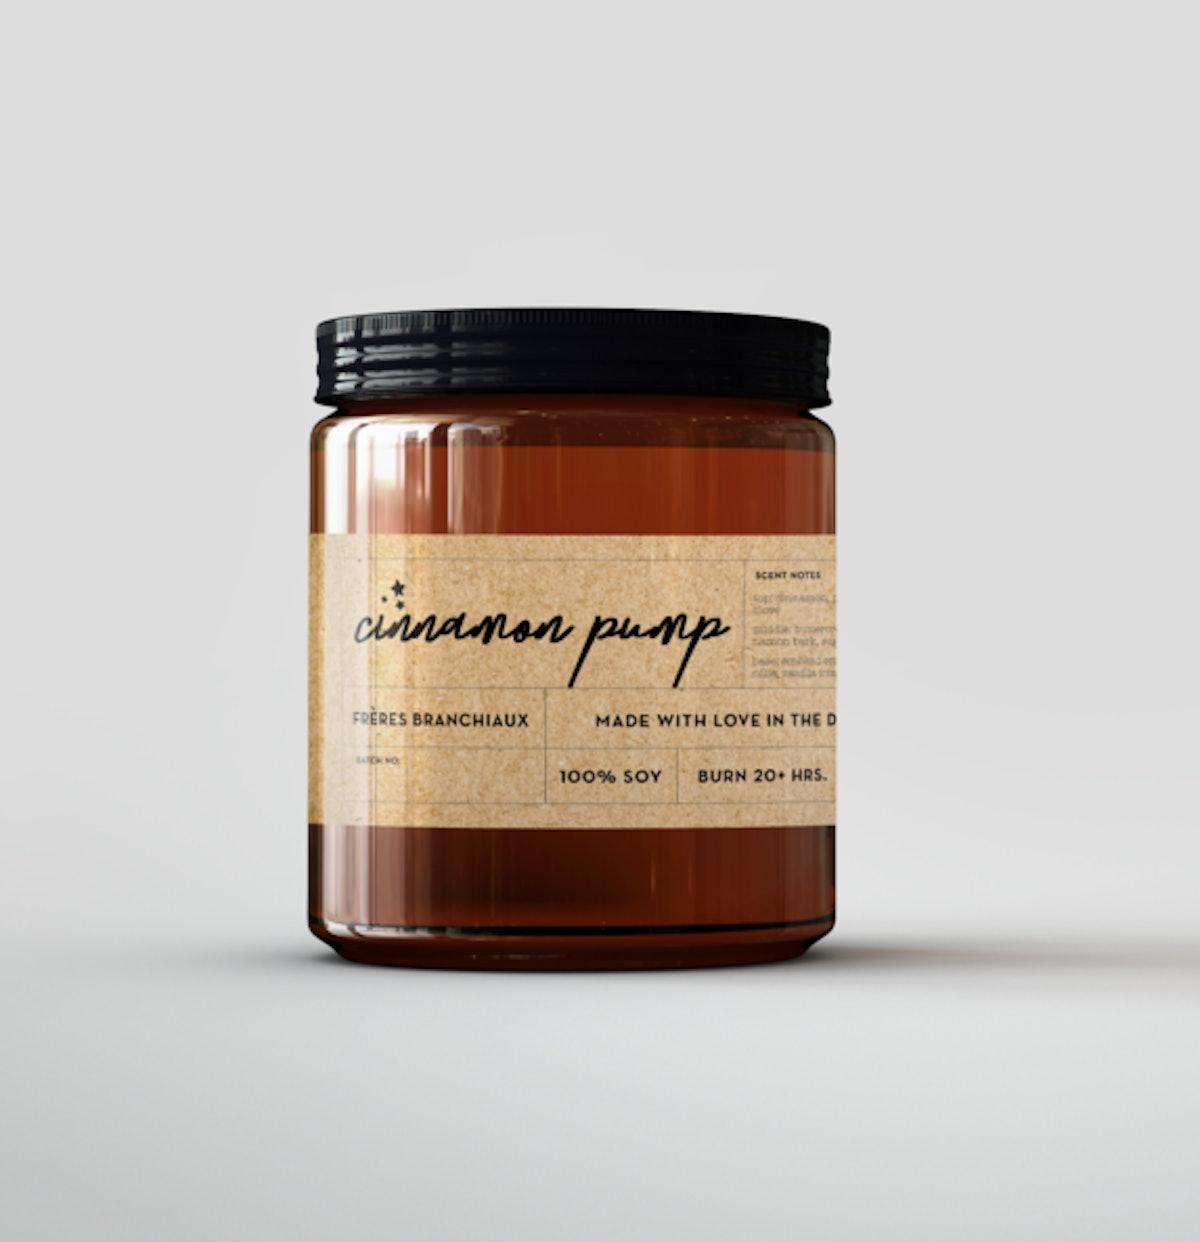 Cinnamon Pump Candle